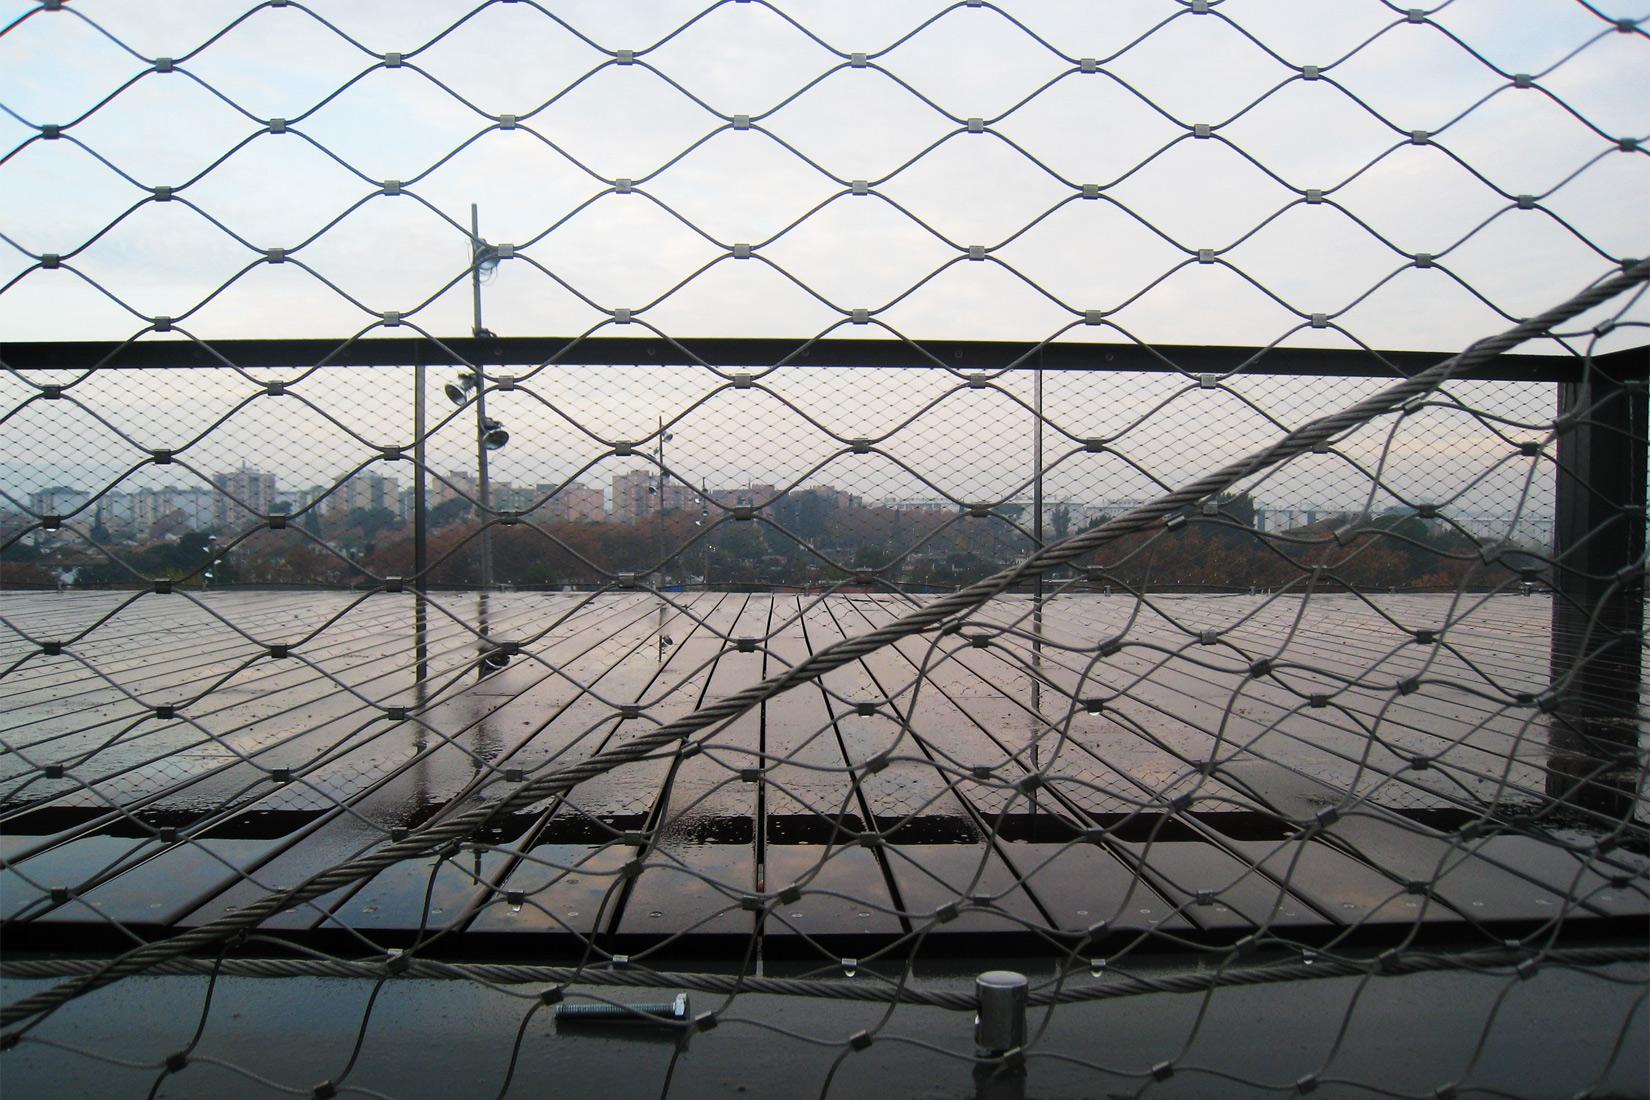 Urbanización Plaza Riu Sec -Pasarela peatonal-puente- Montserrat Periel AMB